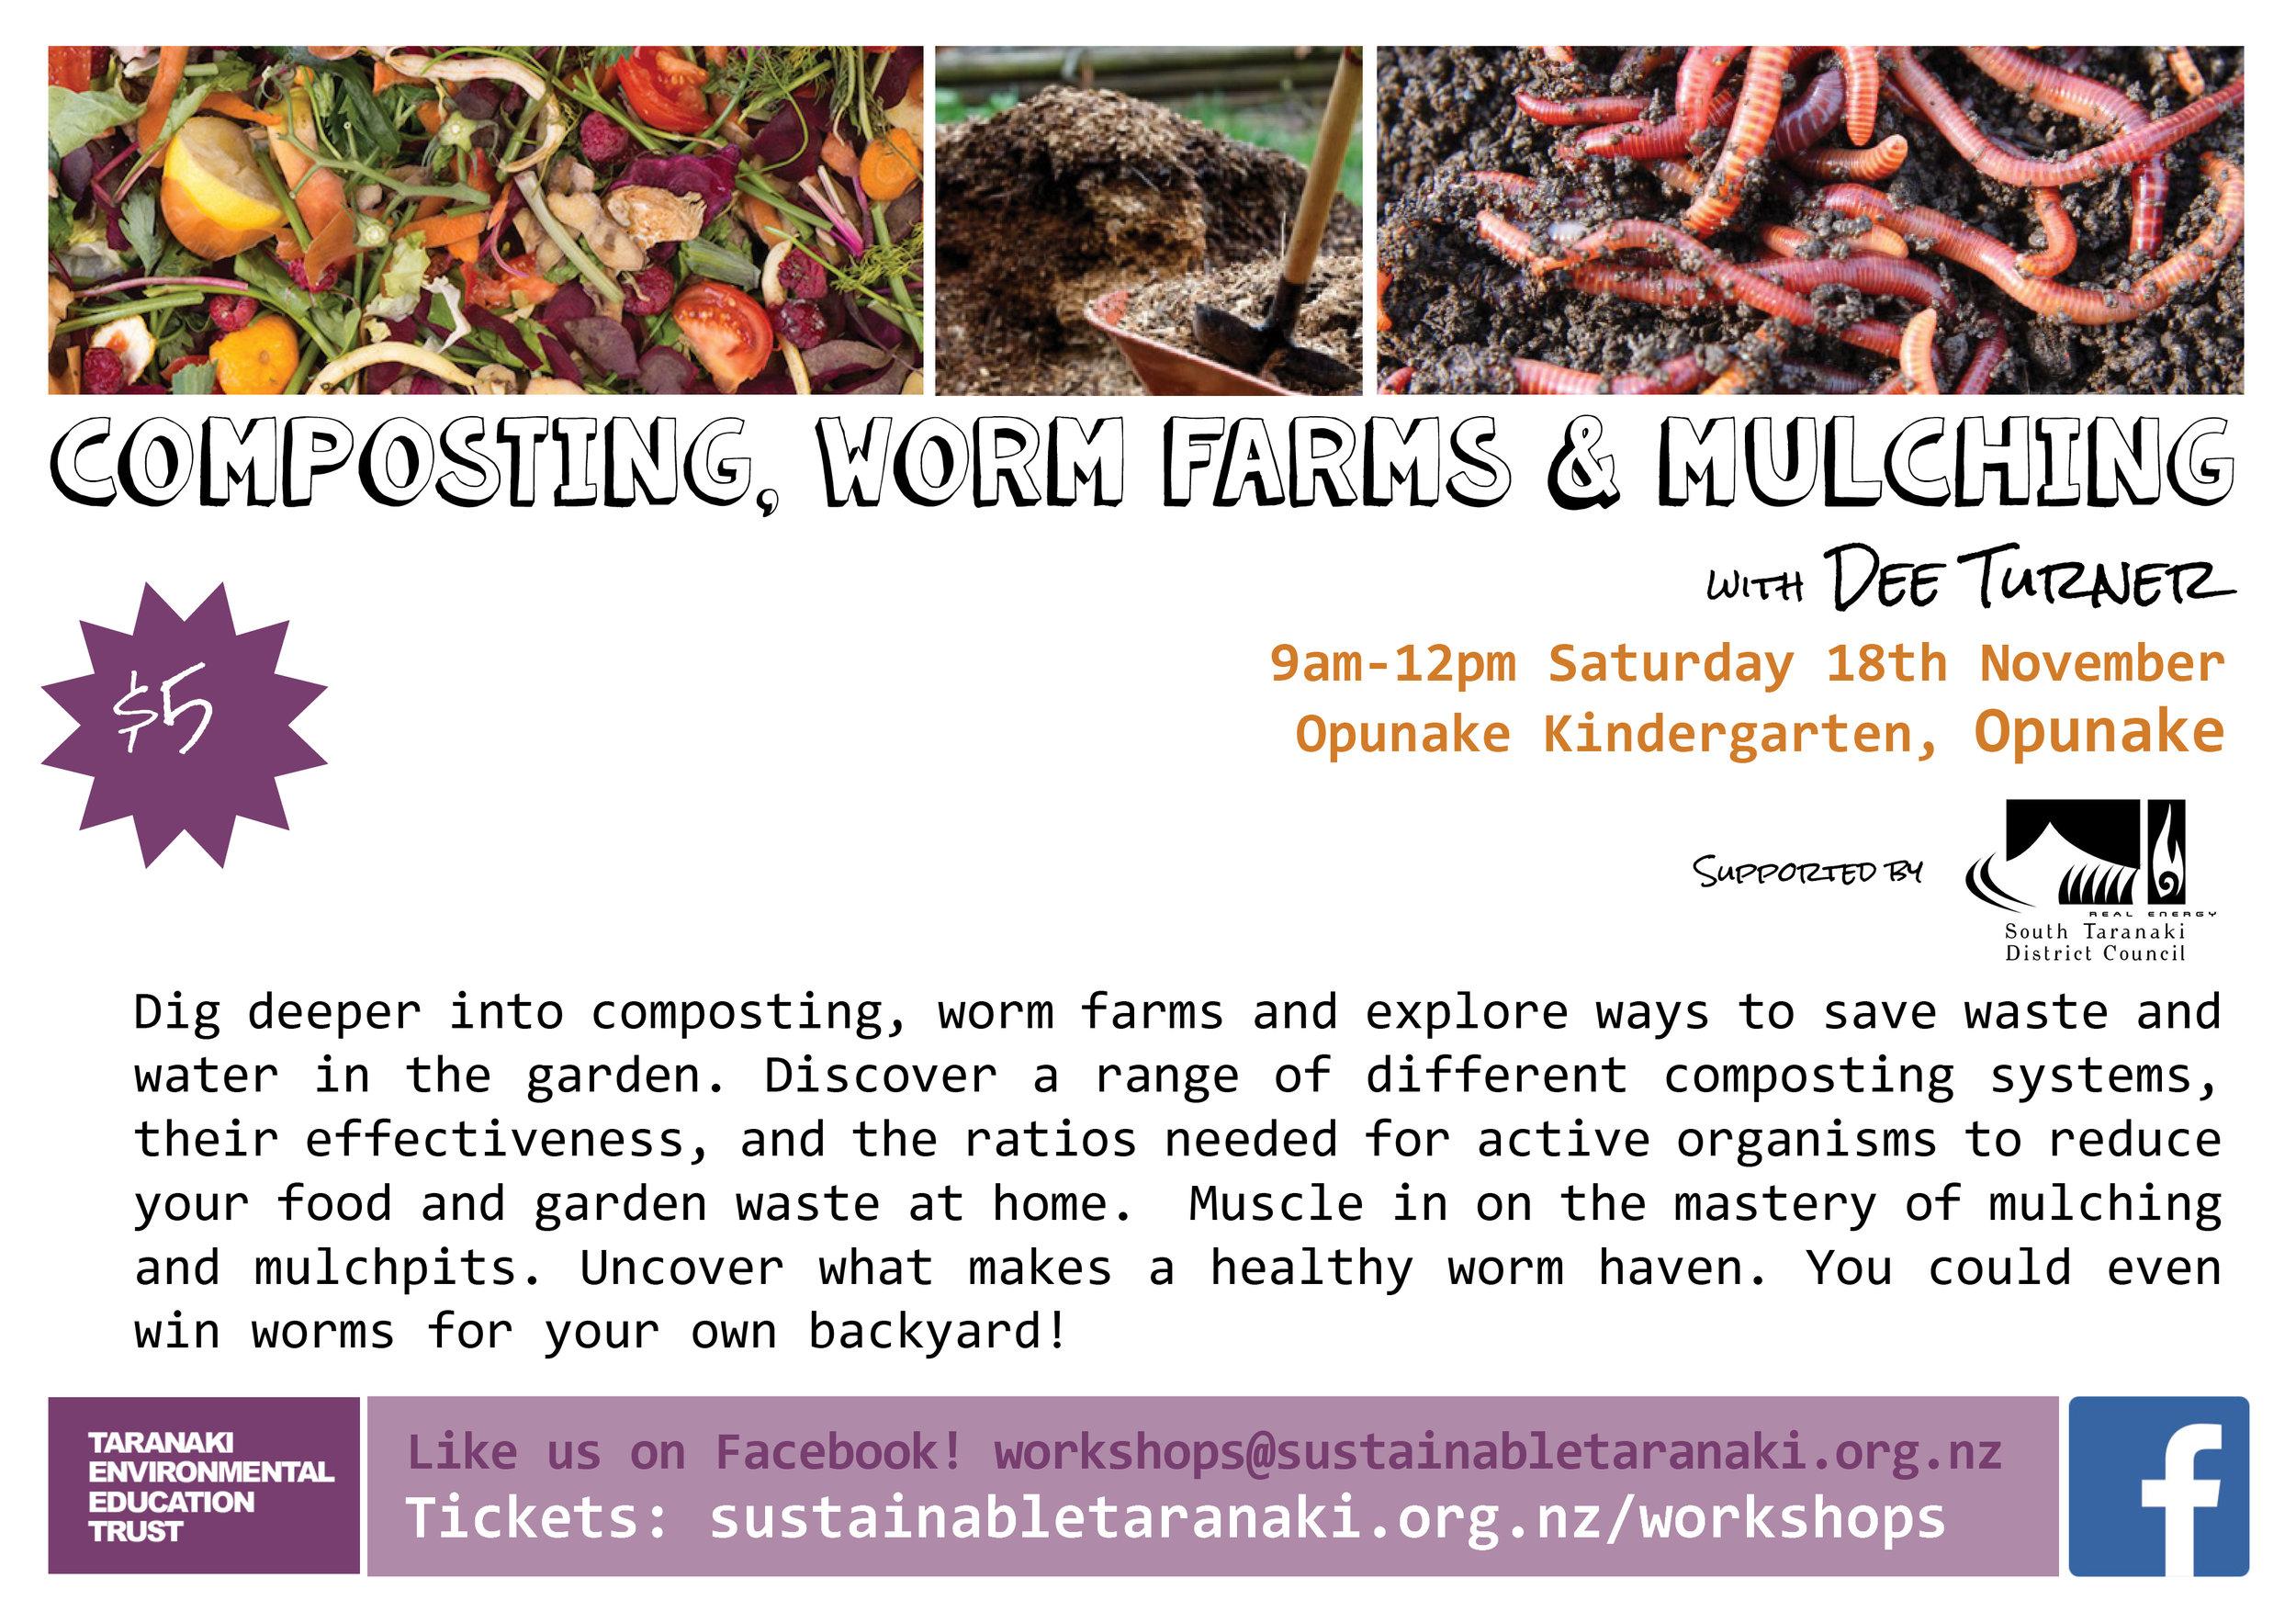 warm farm opunake (1).jpg